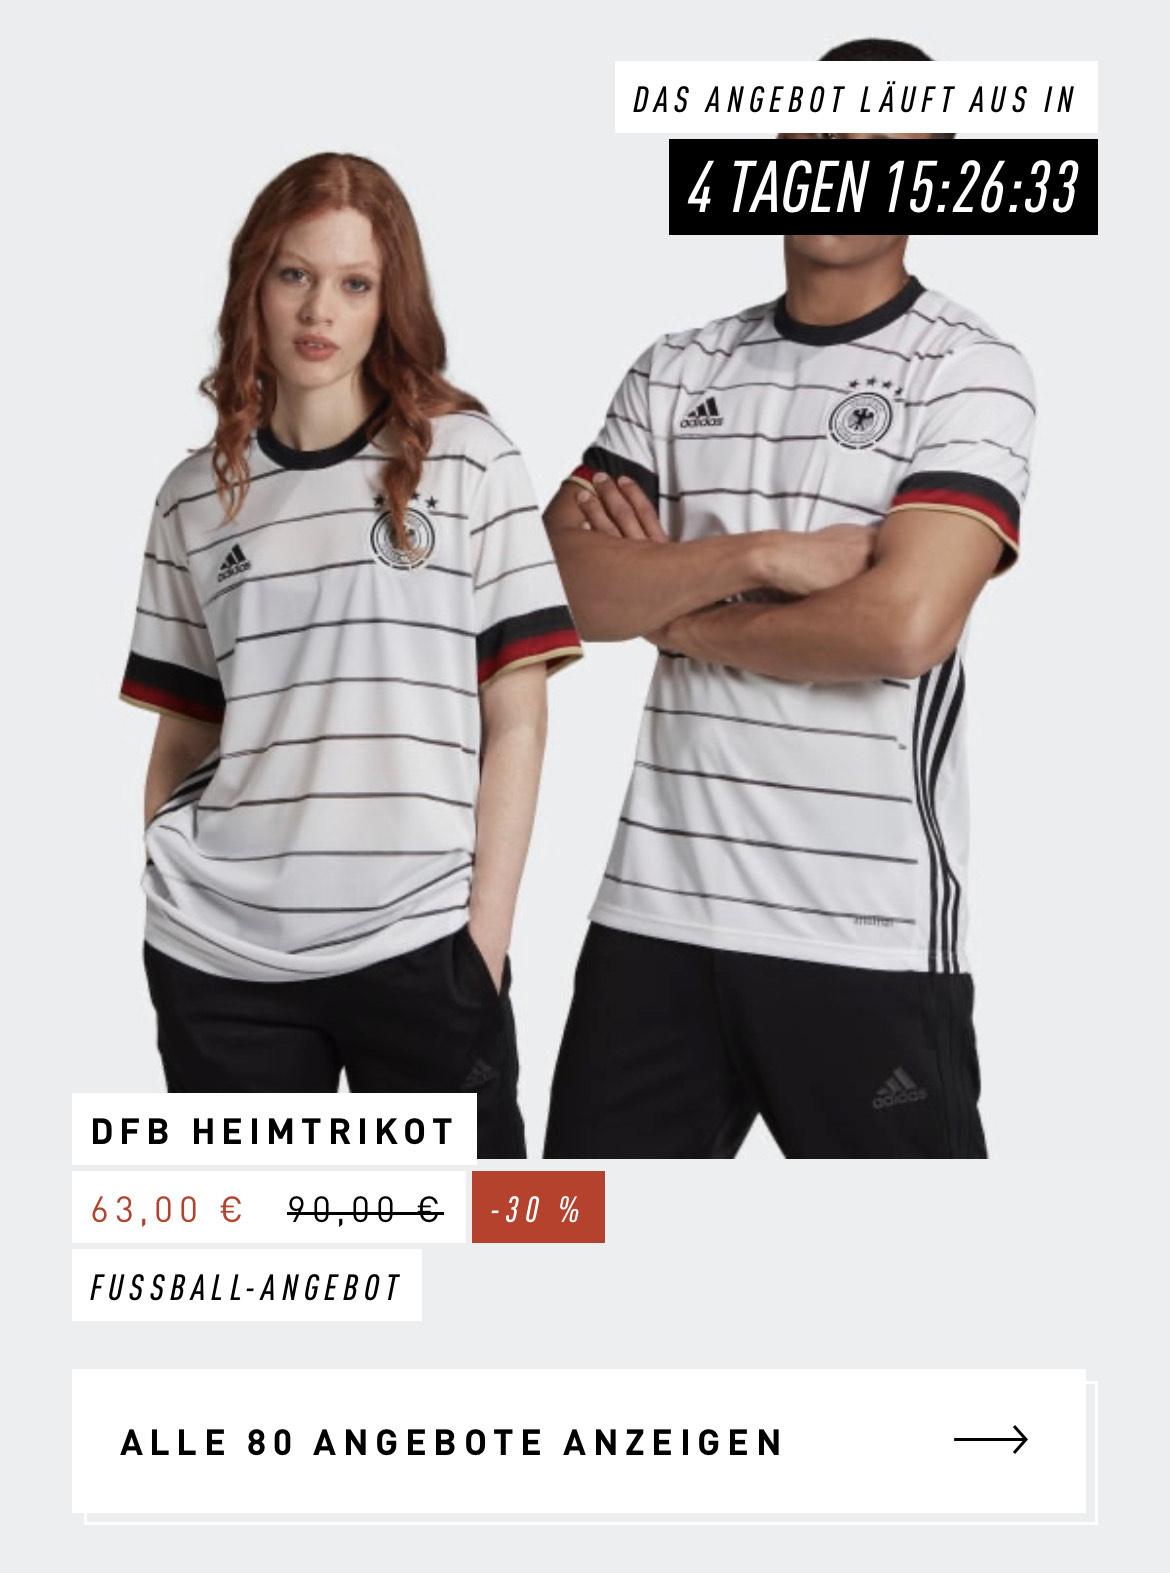 DFB Heimtrikot (personalisierbar) | Adidas (über die Adidas App)